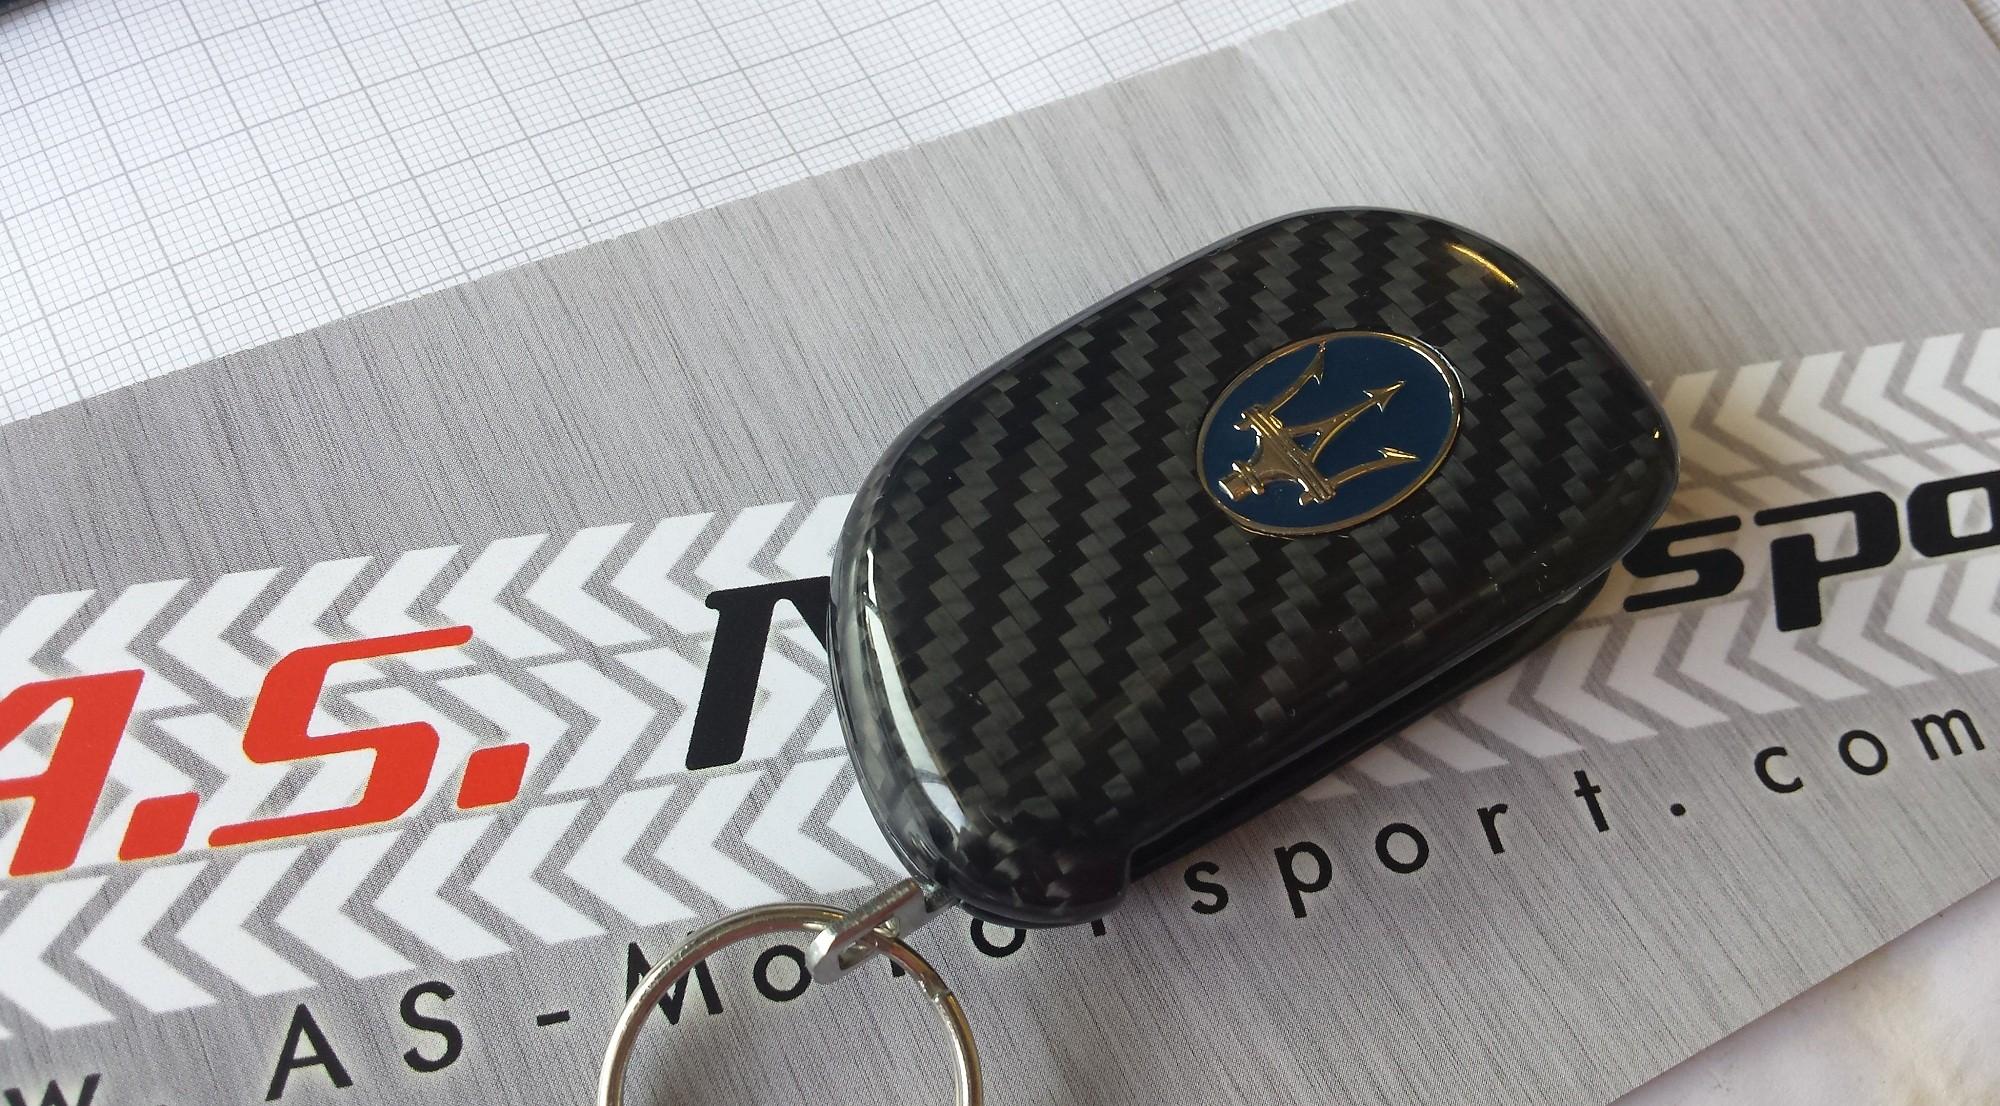 Maserati ghibli key fob